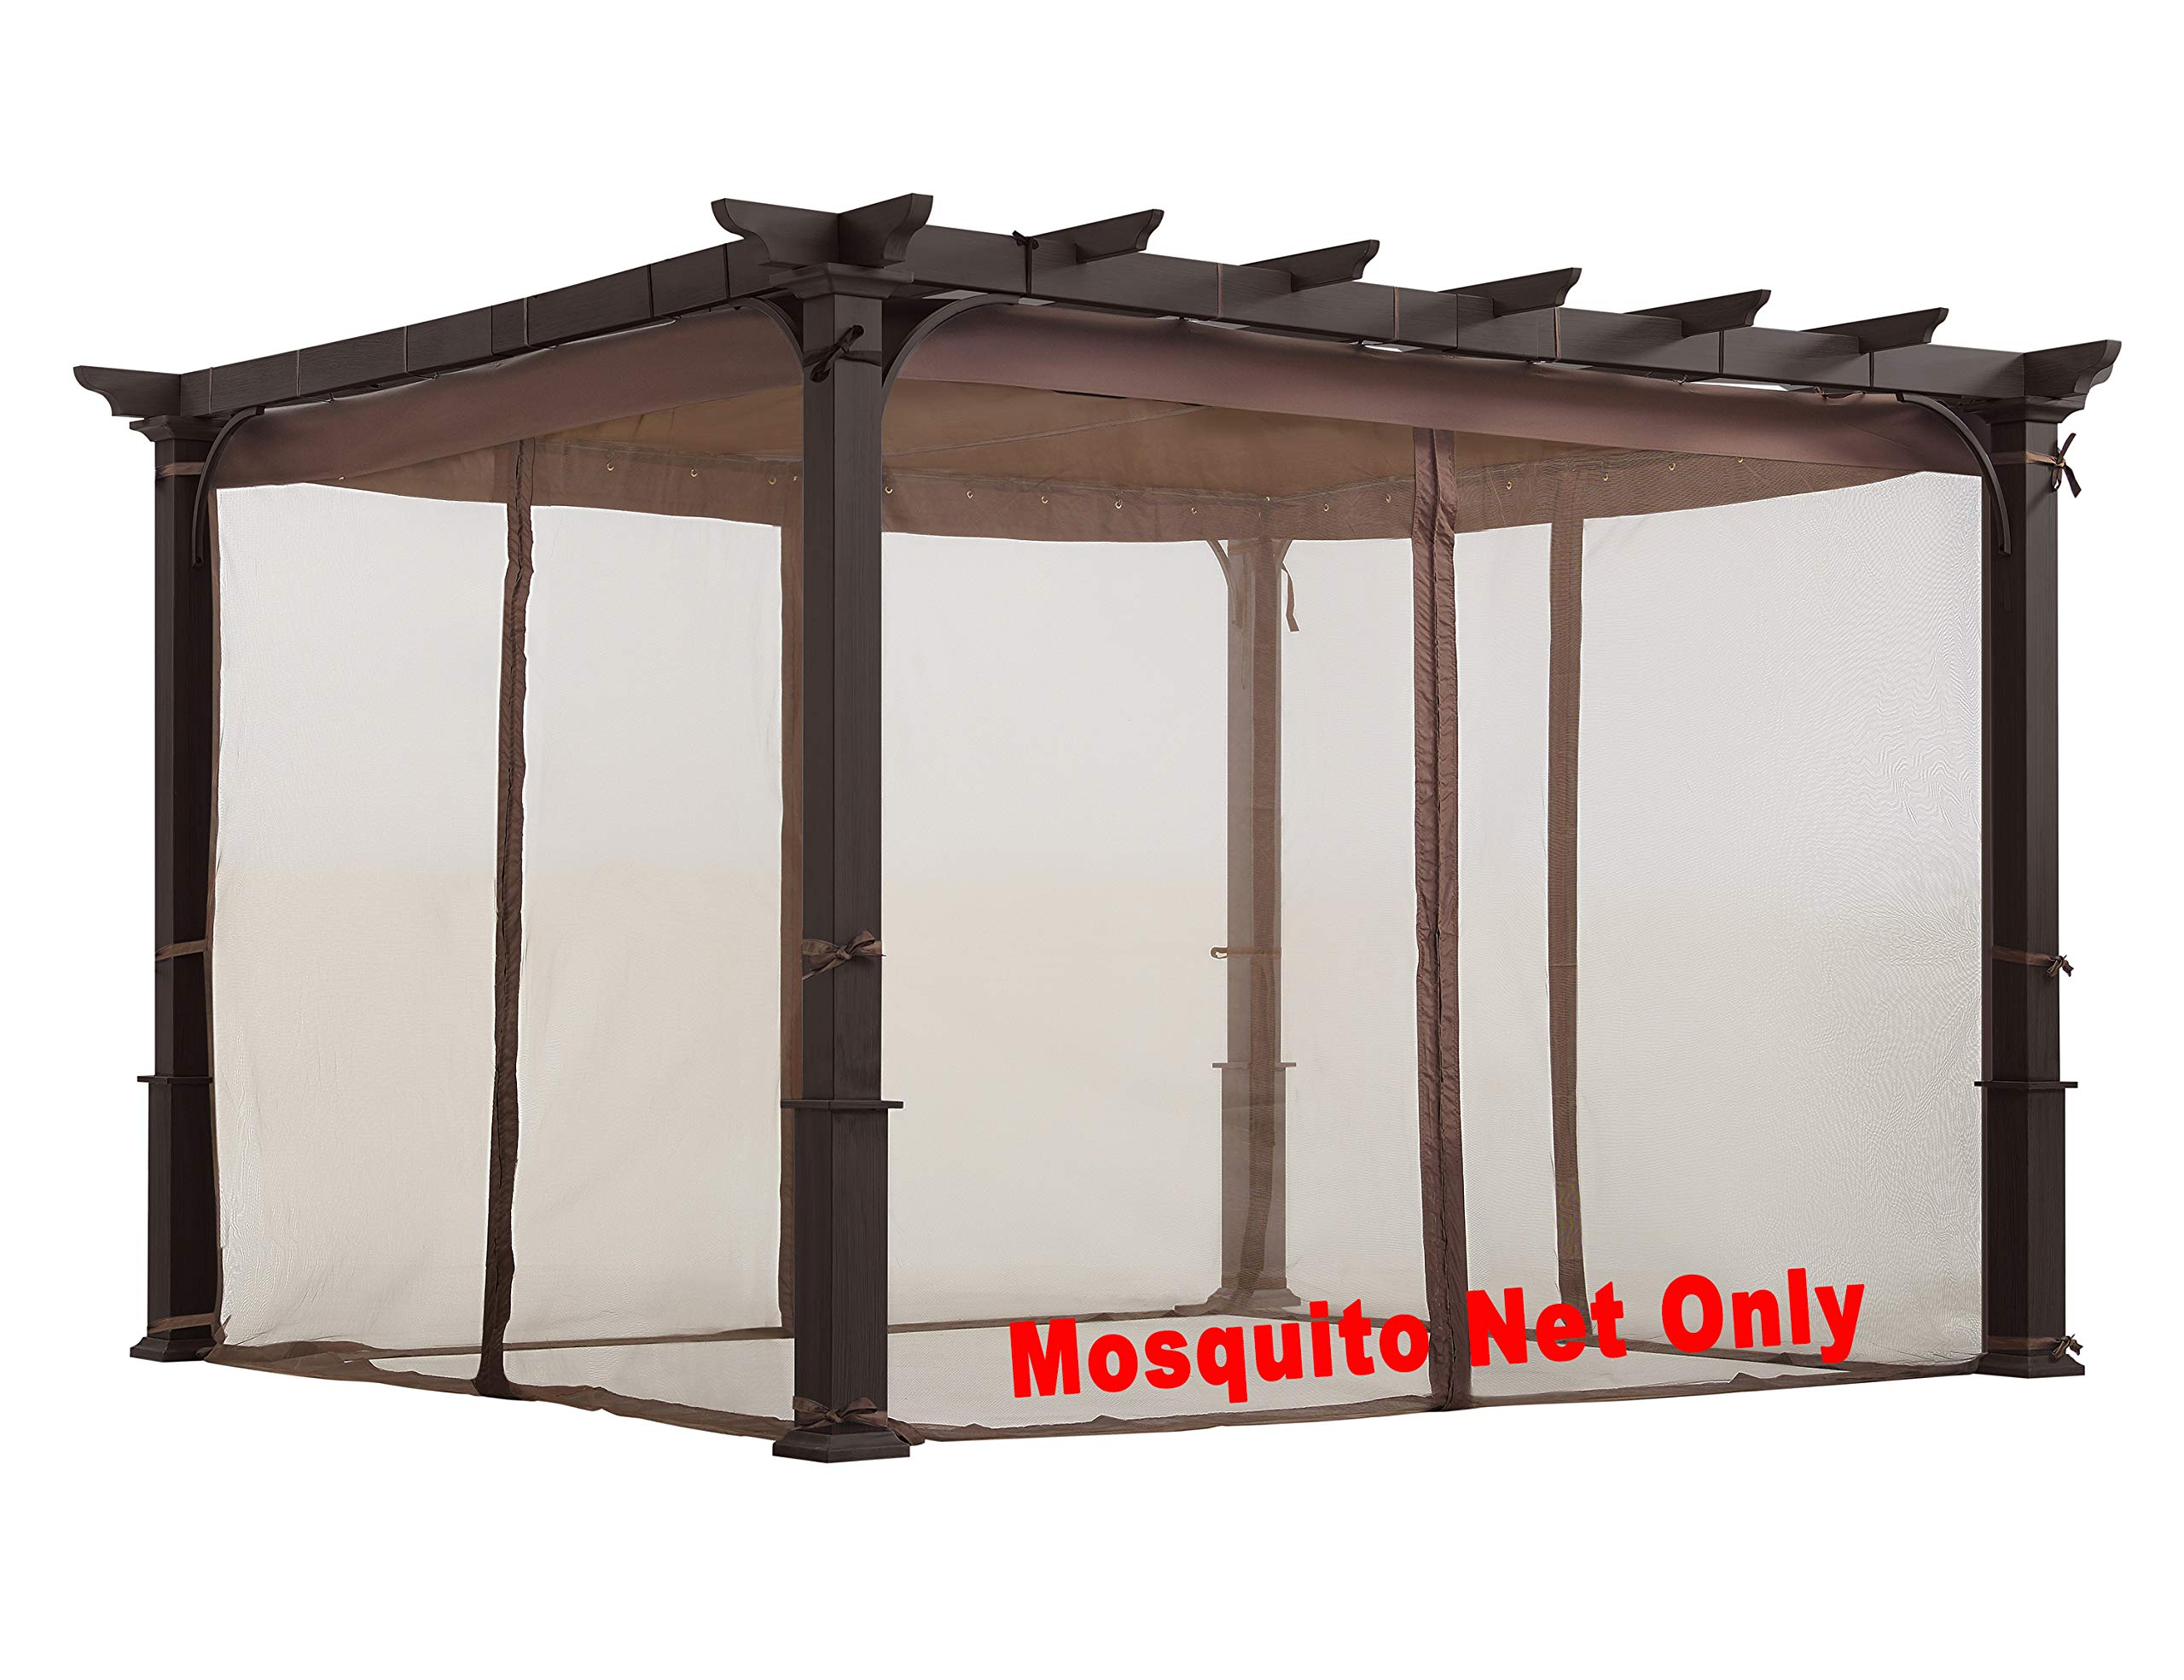 ALISUN Mosquito Net for Flat-Roof Pergola - Mesh Bug Net Only (10 ft. x 10 ft, Brown)